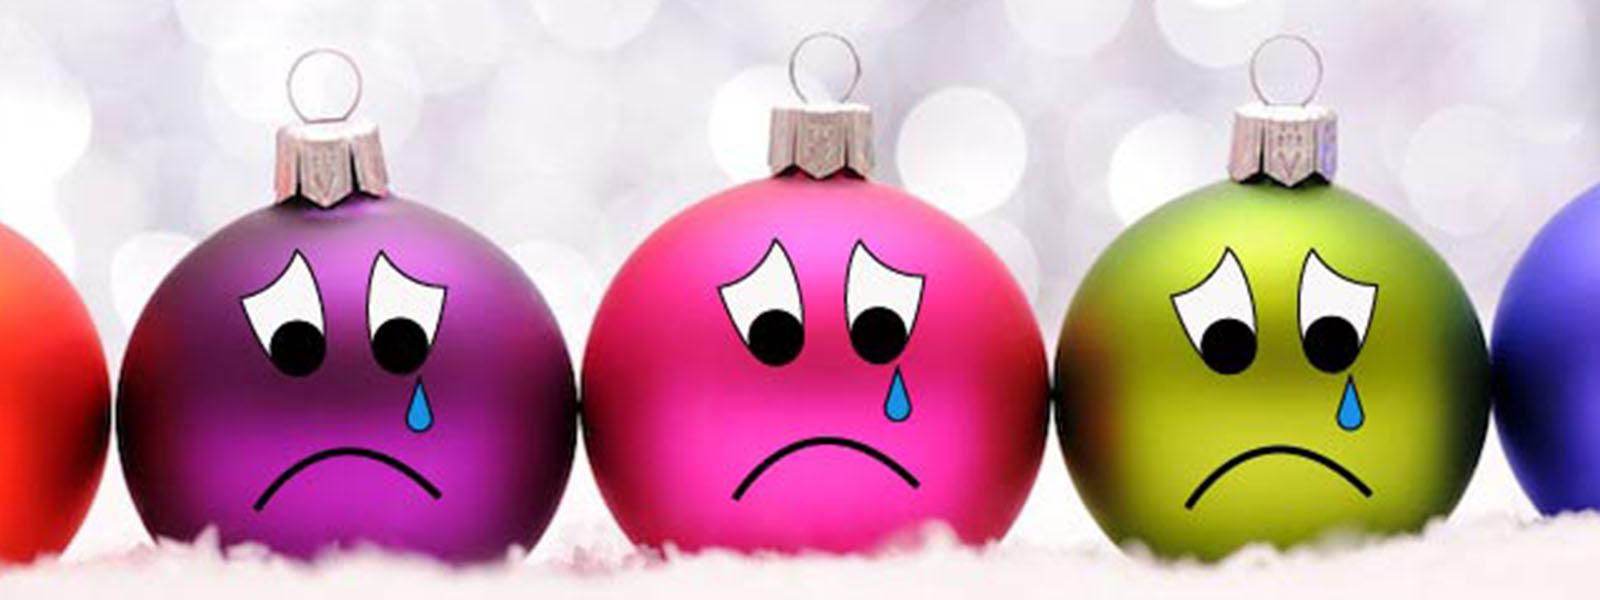 Sad Baubles